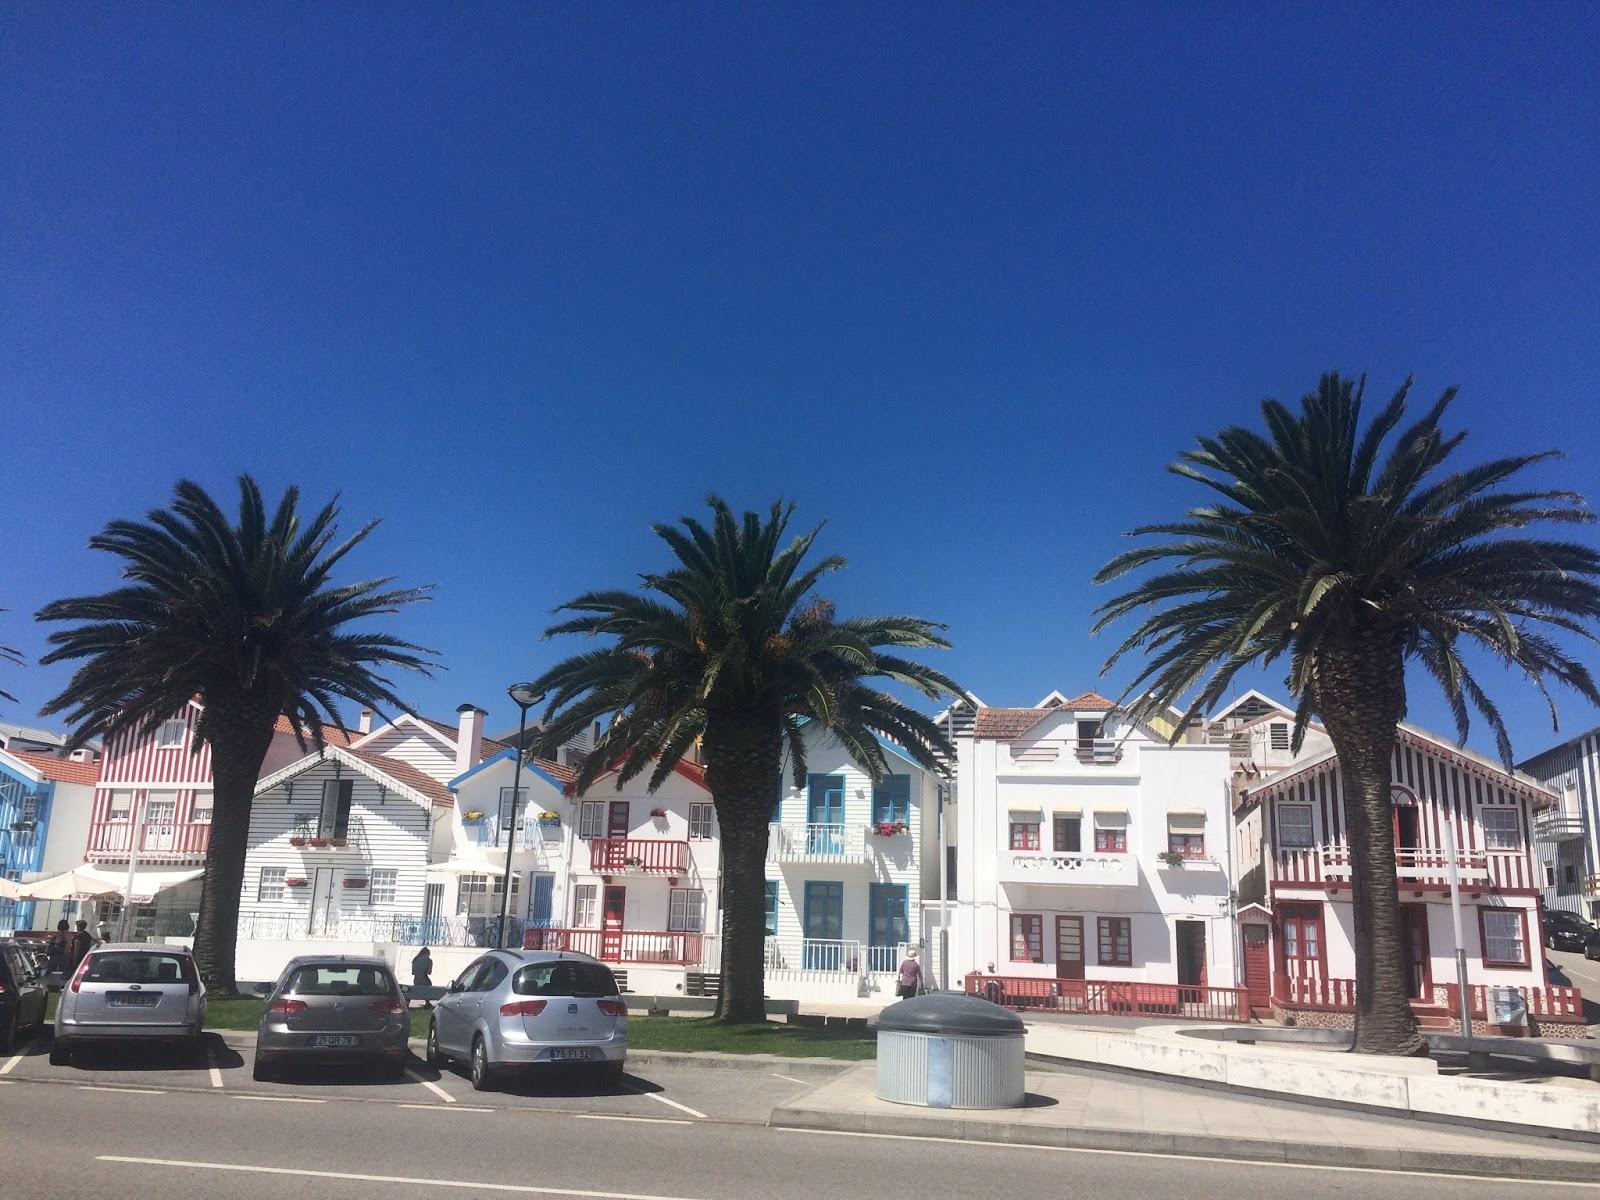 domki w paski thedailywonders portugalia aveiro